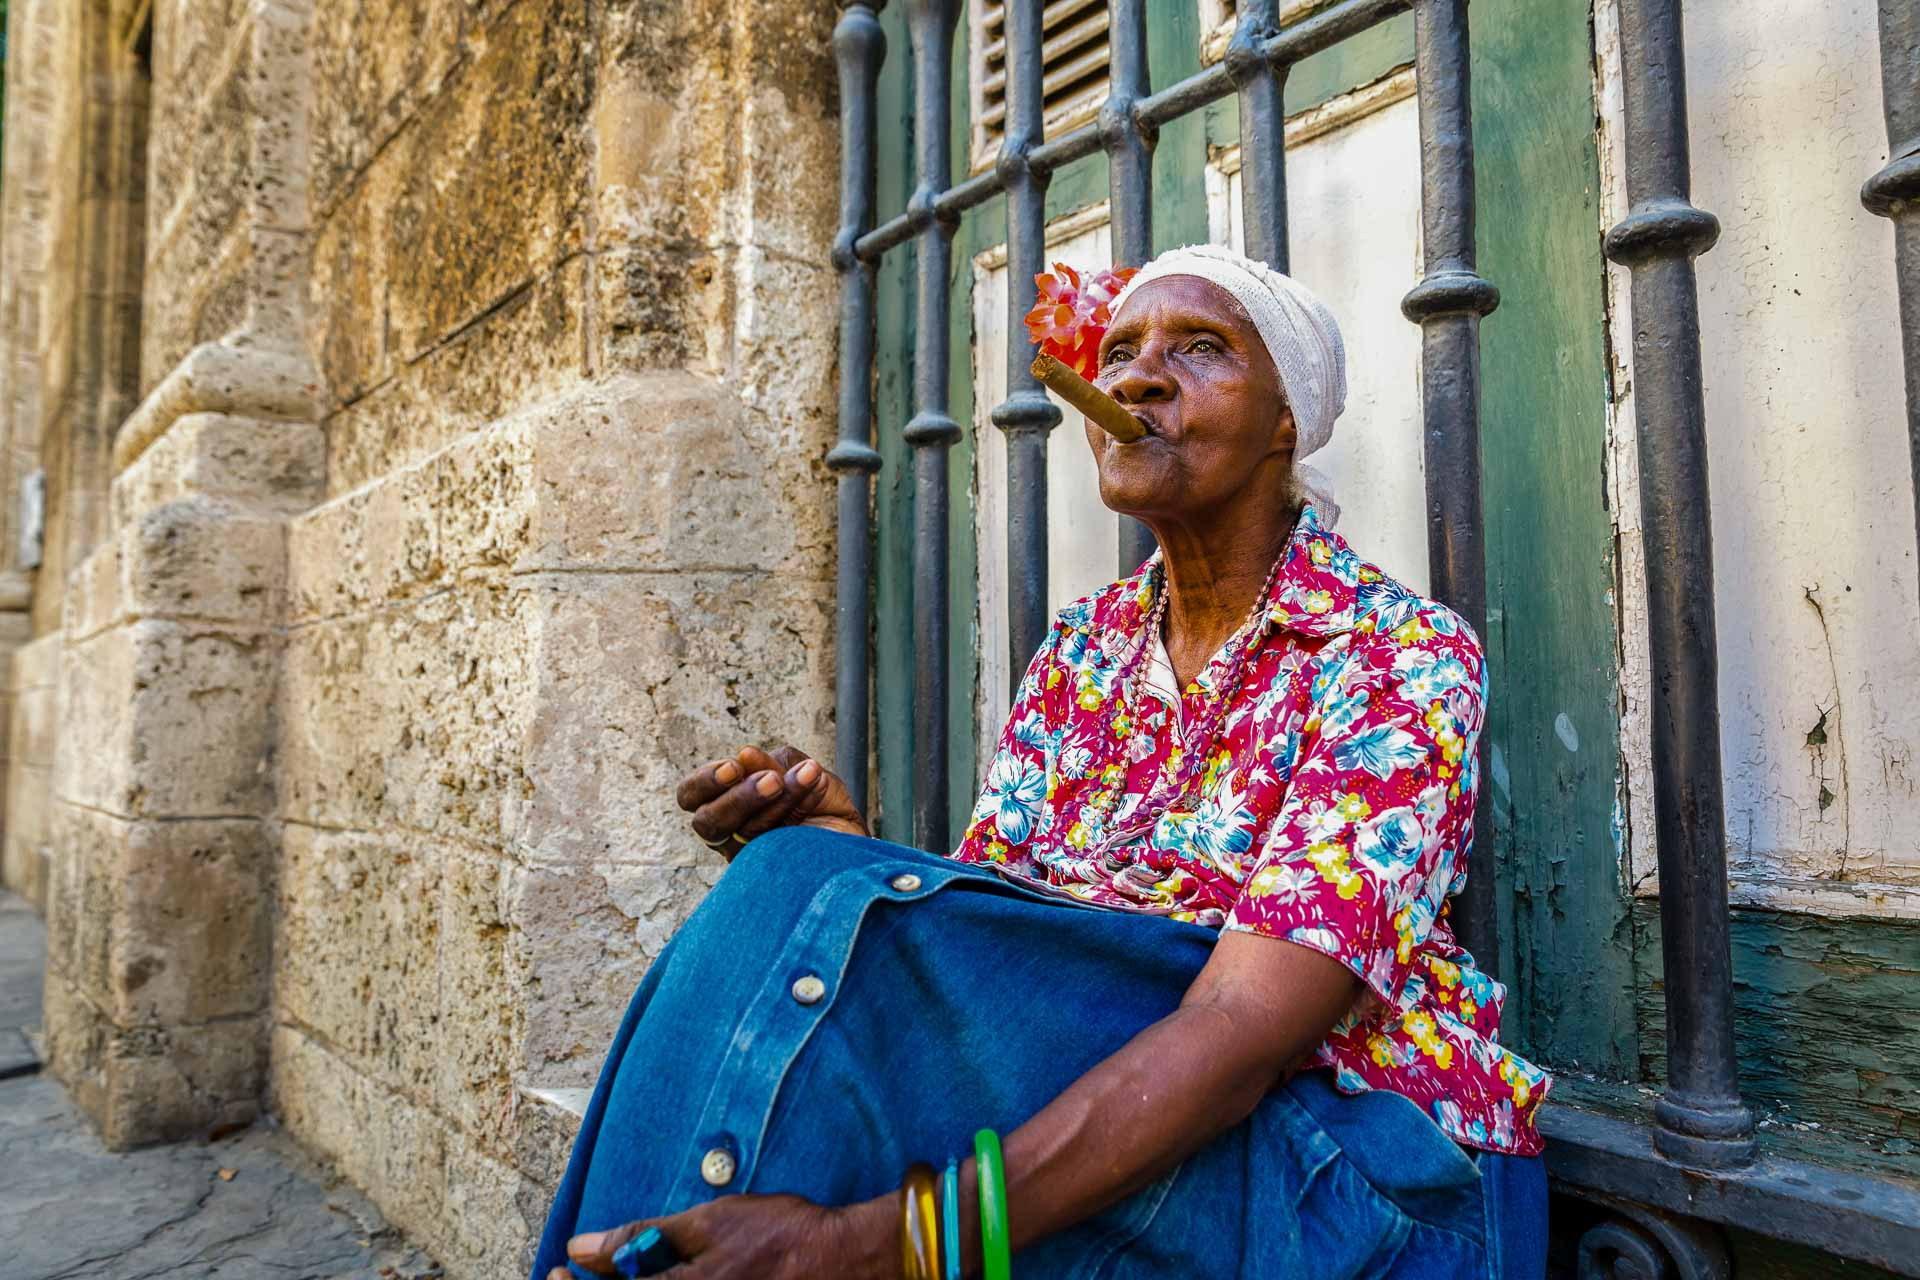 Frau mit Zigarre - Kuba Rundreise